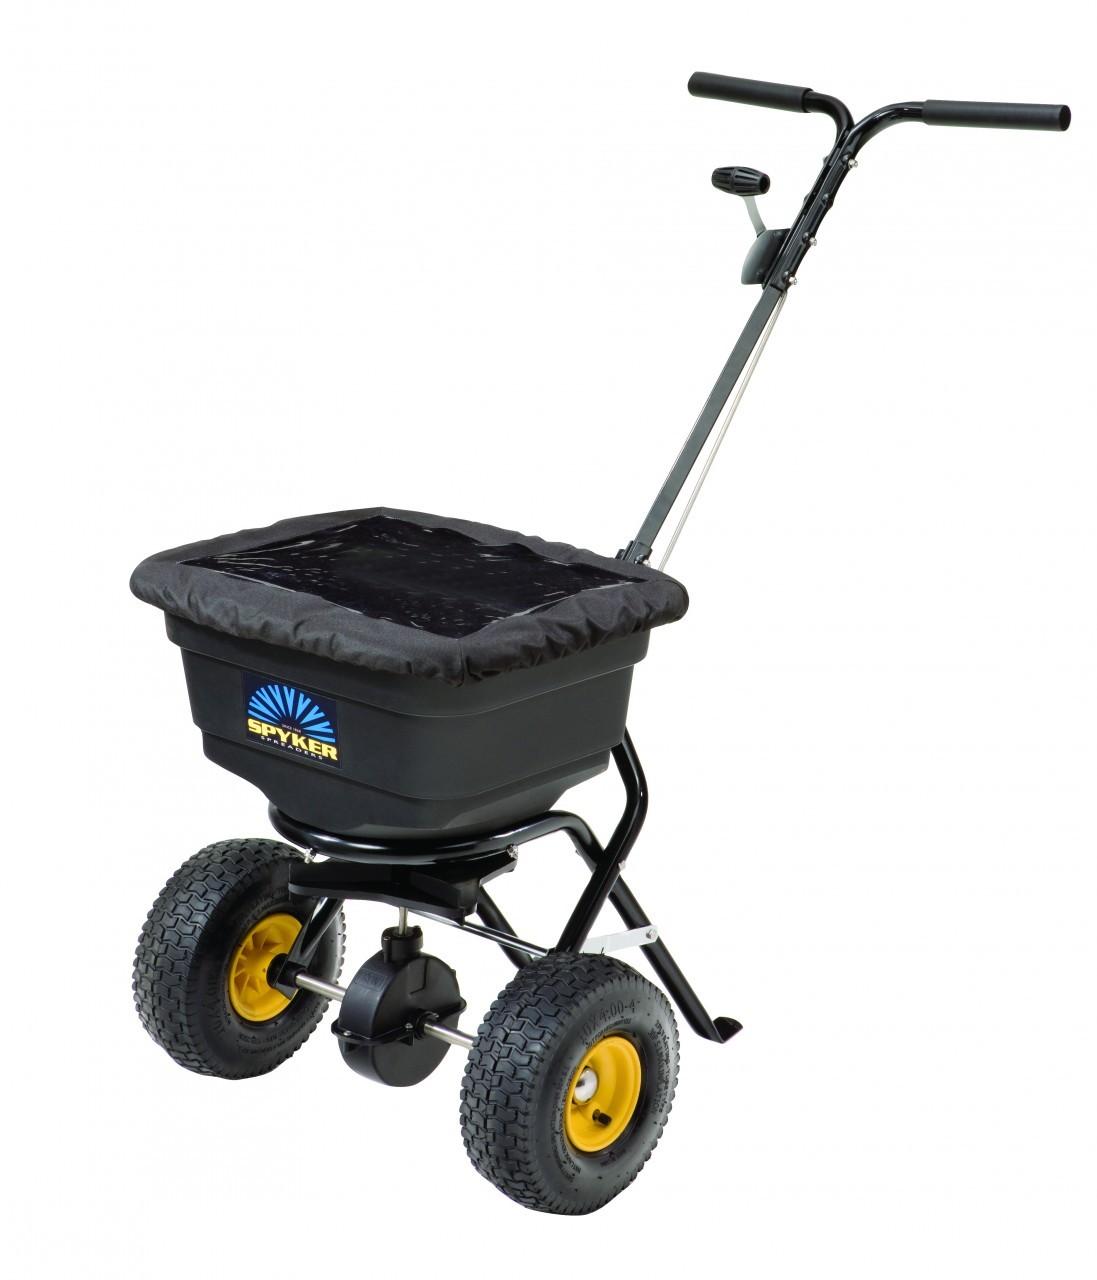 Best Lawn Fertilizer >> Fertilizer Spreader - Taylor Rental of Torrington